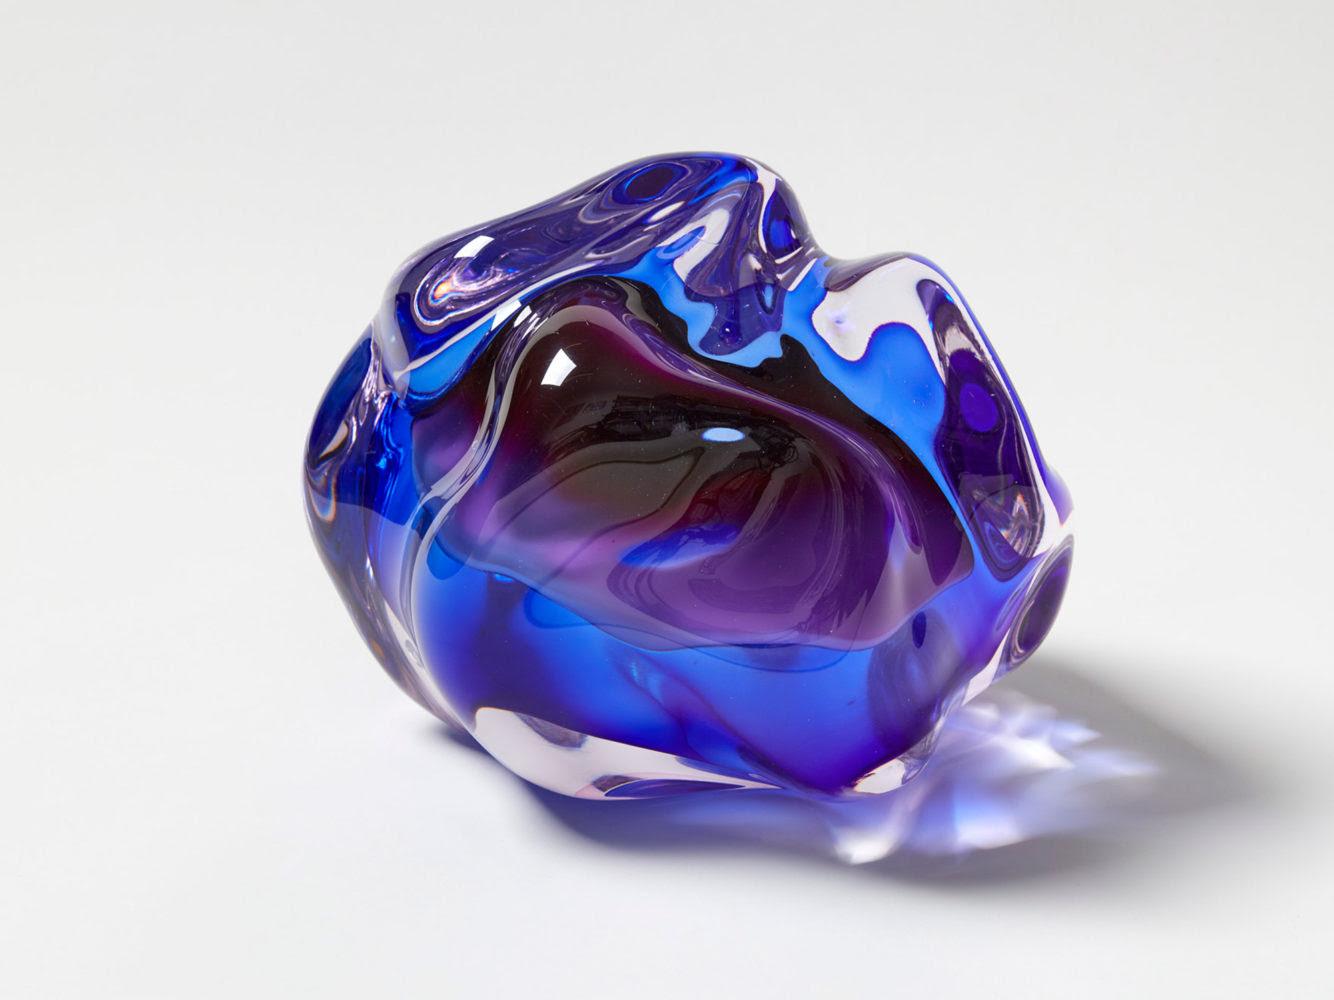 Fluid Rocks Artist Flavie Audi Forms Gem Like Sculptures From Glass